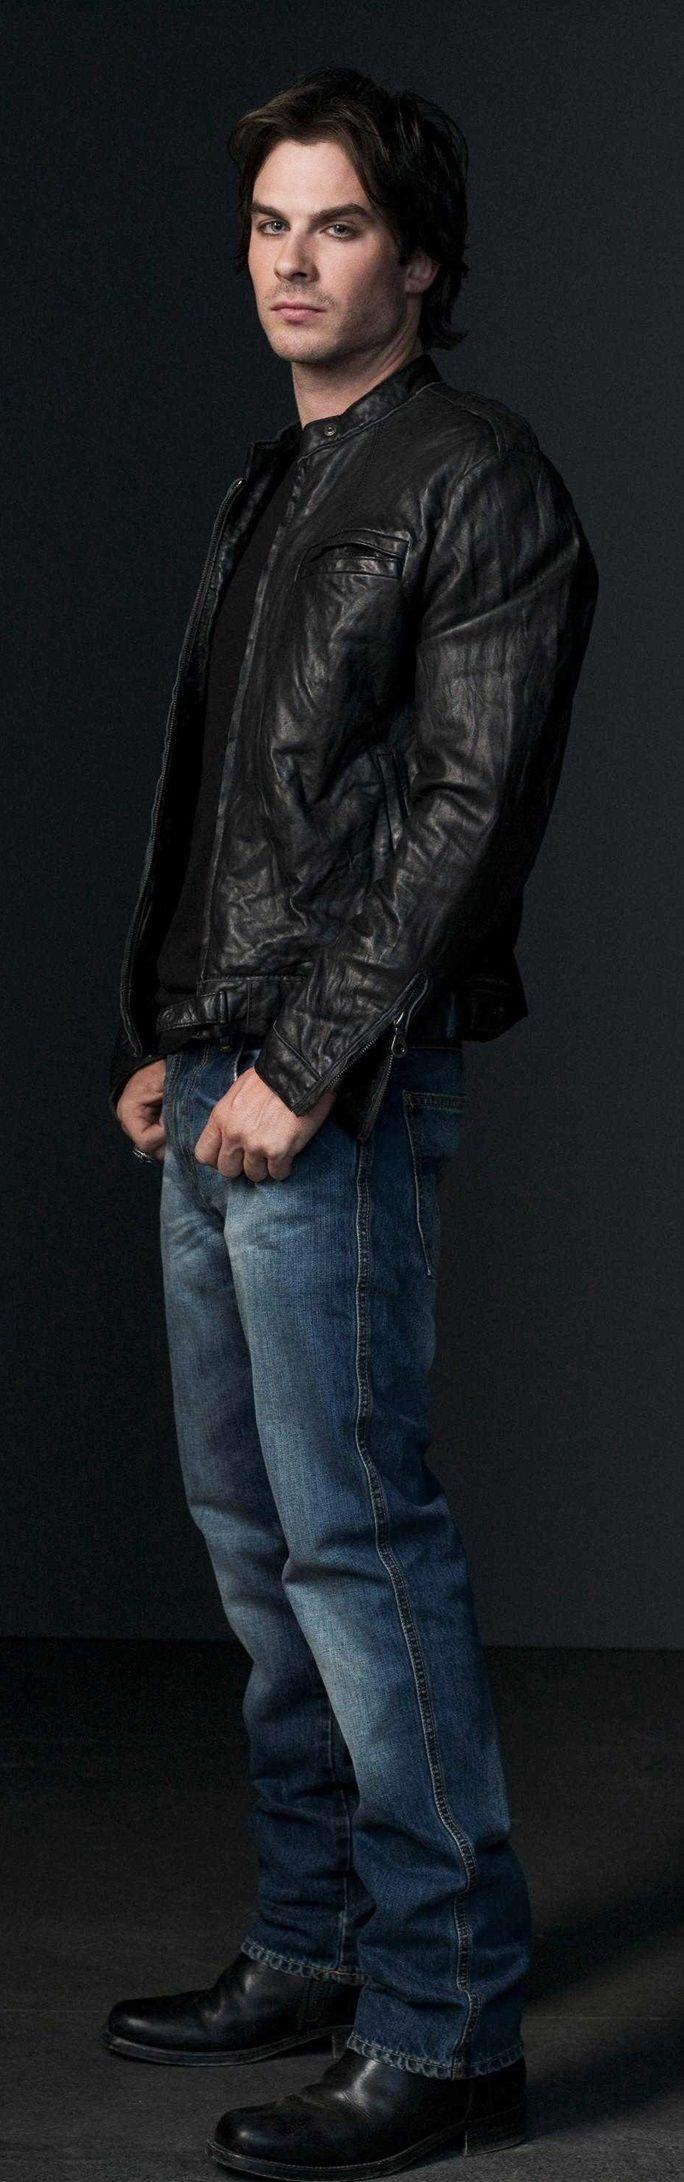 Ian Somerhalder as Damon Salvatore